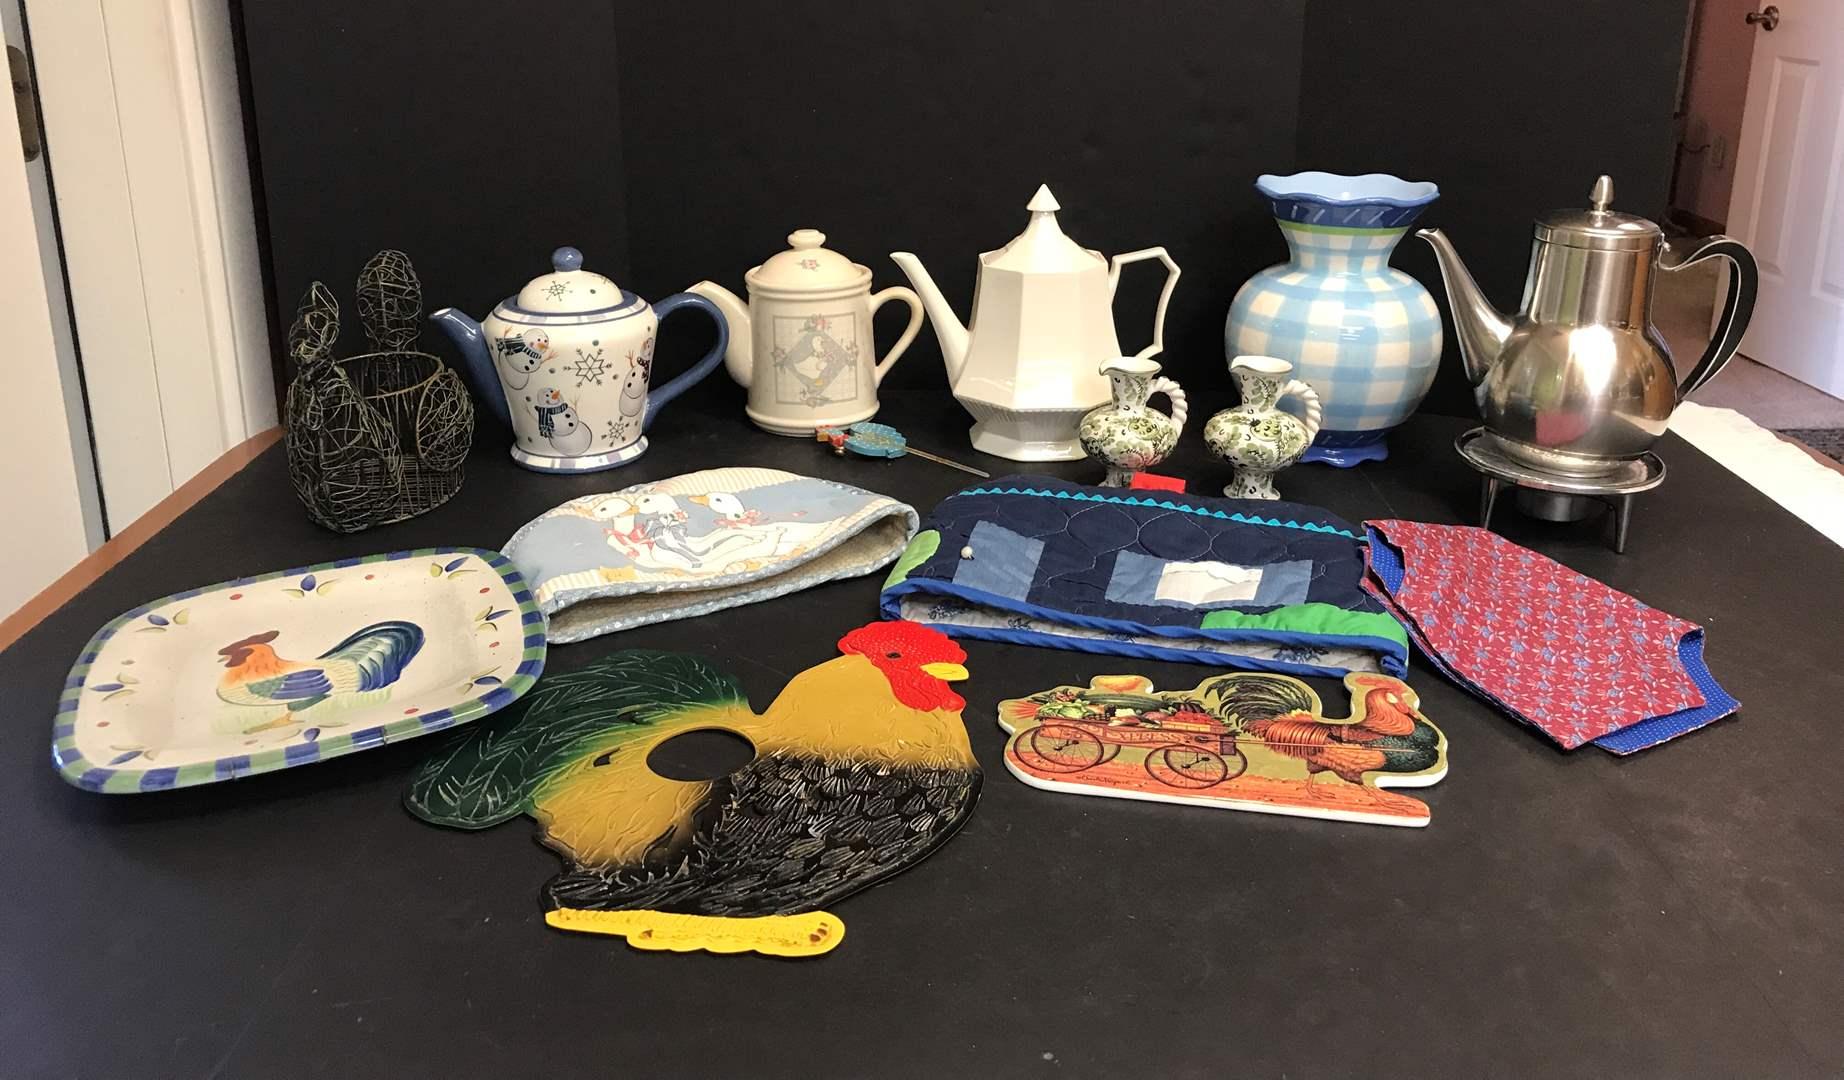 Lot # 80 - Tea Pots, Vase, Toaster Cover & More (main image)